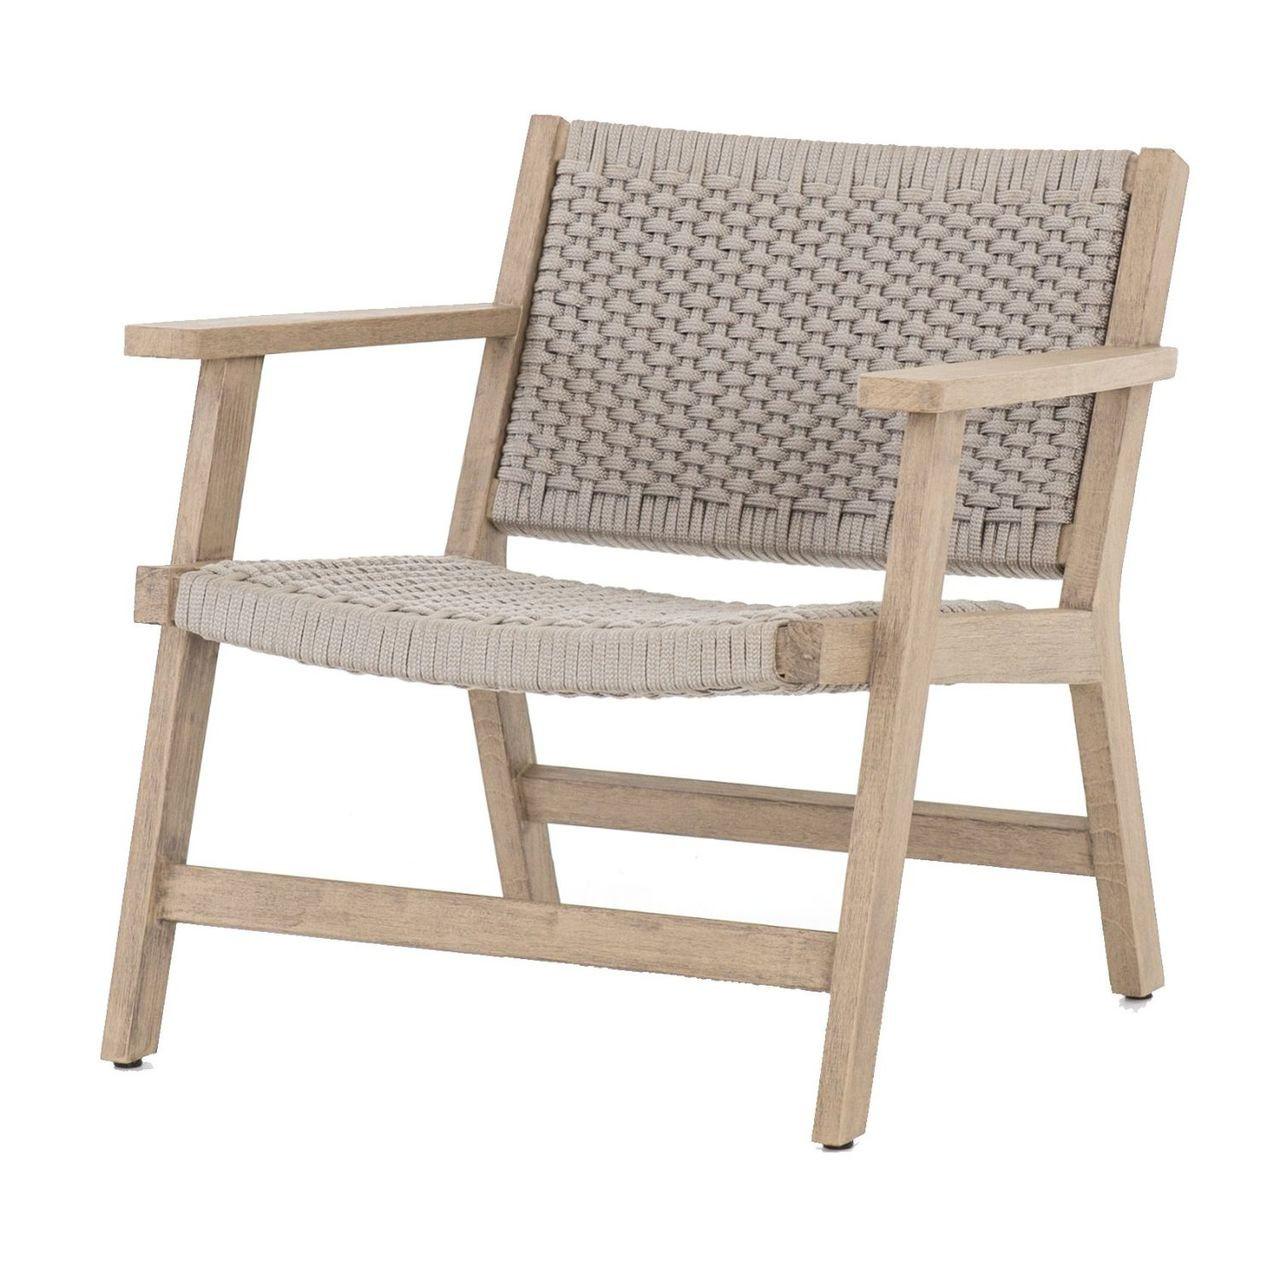 Delano natural teak outdoor rope chair grey brown